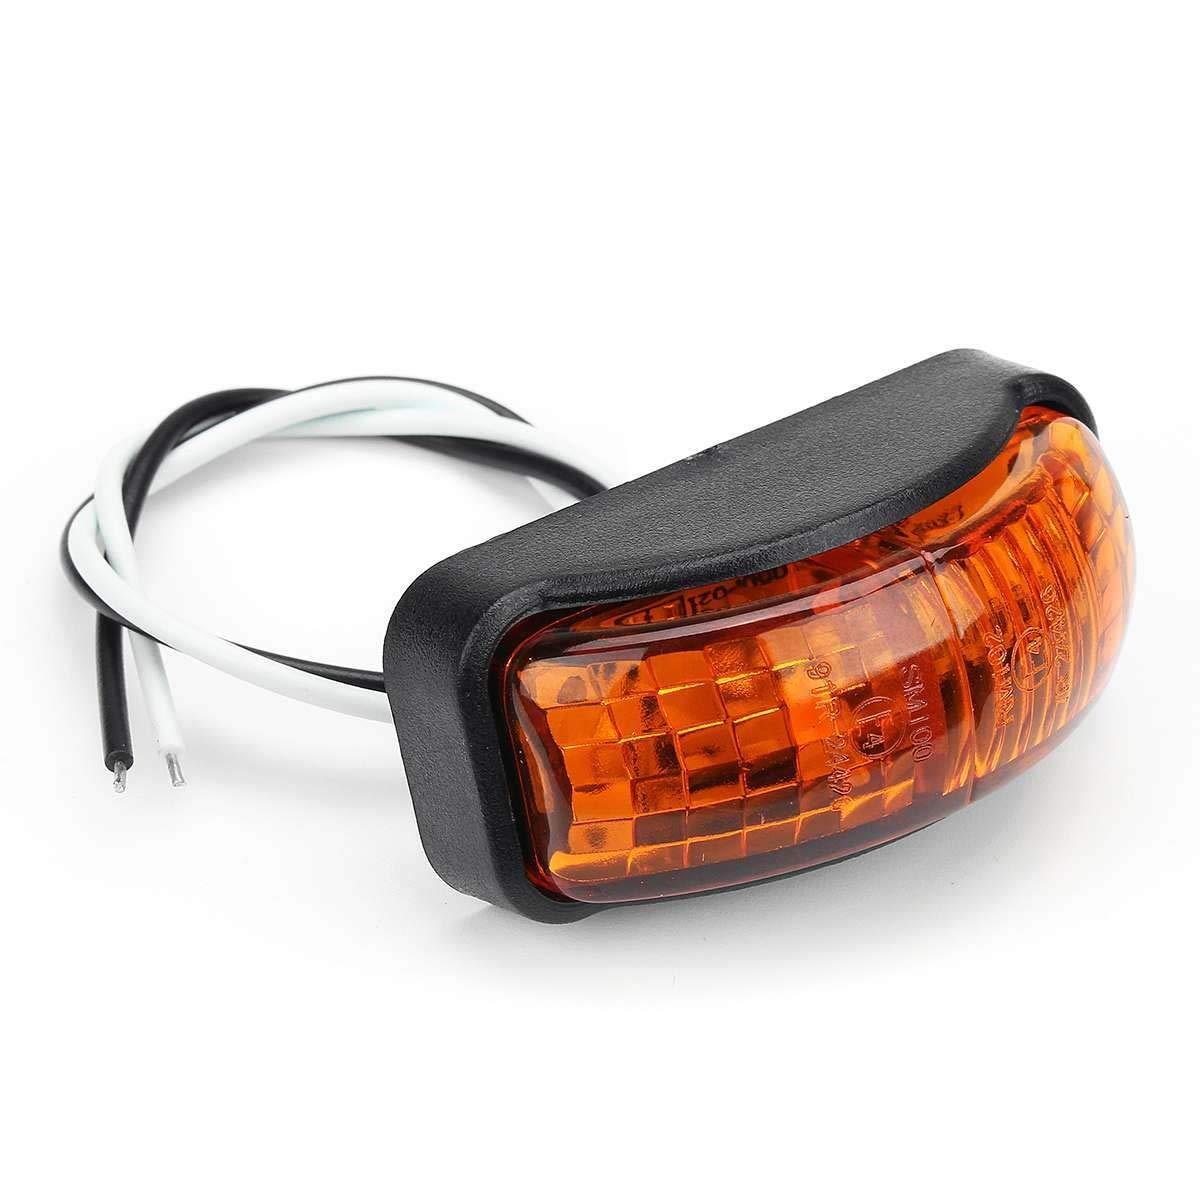 Hadeyicar 2pcs 12V Coche de la luz Exterior Blanco 6 SMD LED del Coche cami/ón Cami/ón se/ñalizaci/ón Lateral Indicador Luces del Remolque de Cola Trasera de la luz Pilota